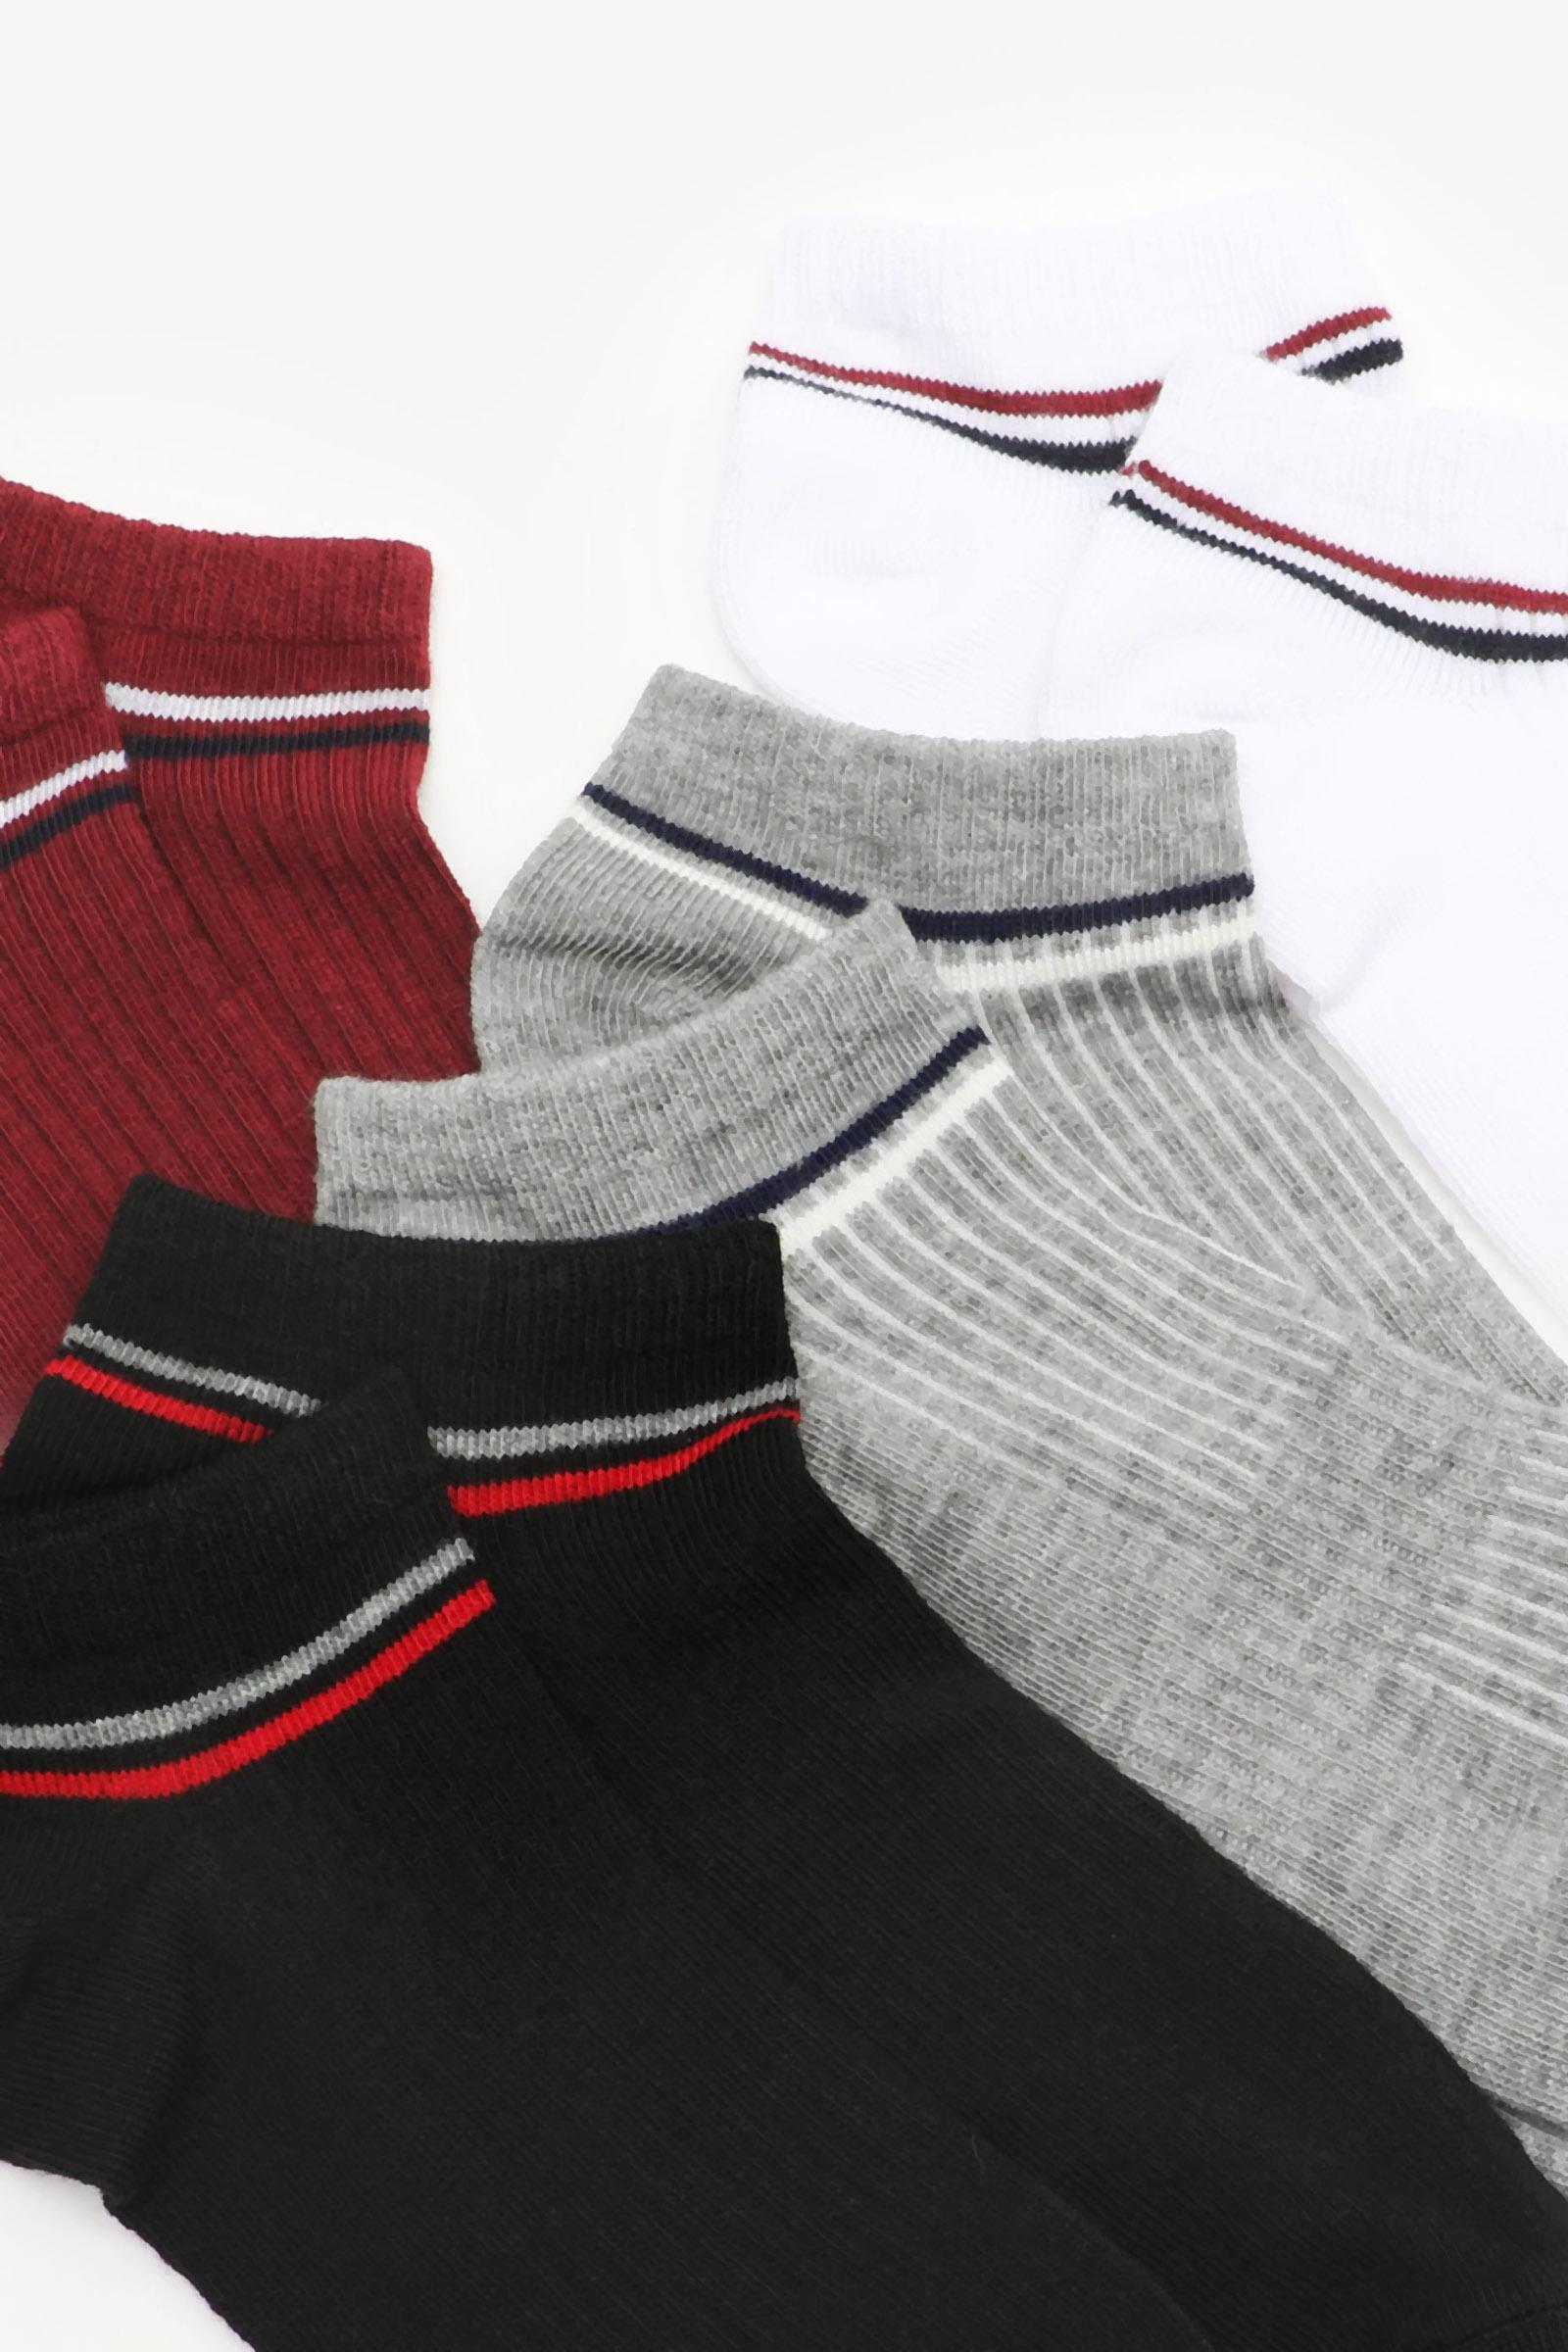 Pack of Ribbed Ankle Socks